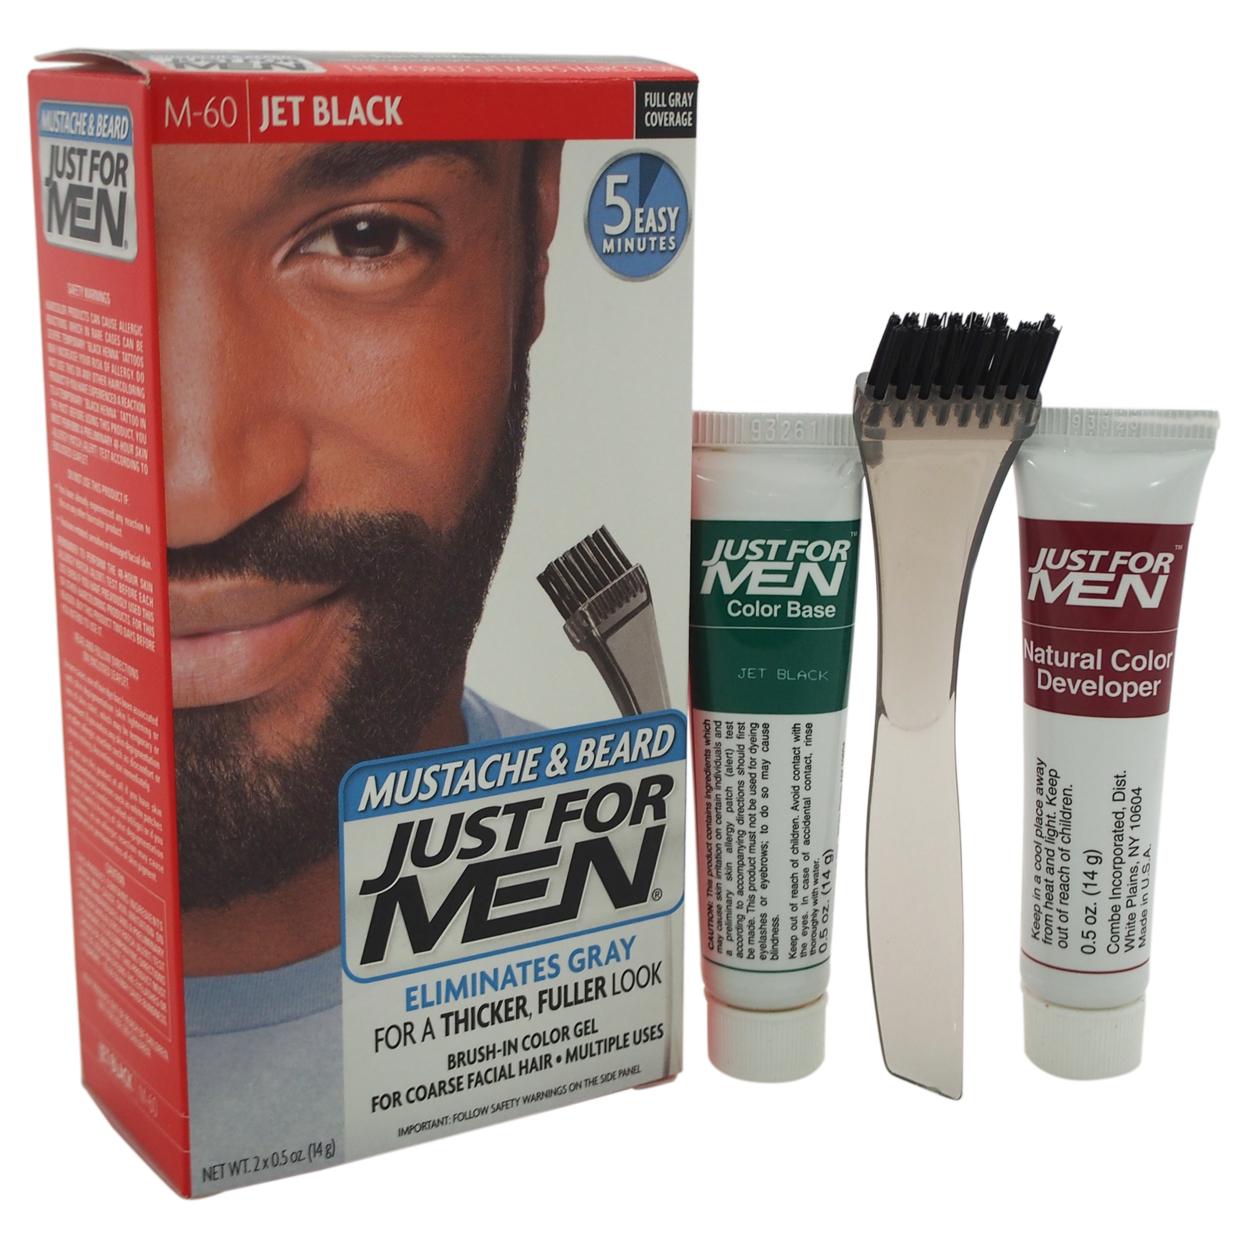 Brush-In Color Gel Mustache & Beard Jet Black # M-60 by Just For Men for Men - 1 Kit Mustache & Beard Color 5898e1b7c98fc450900ecc78